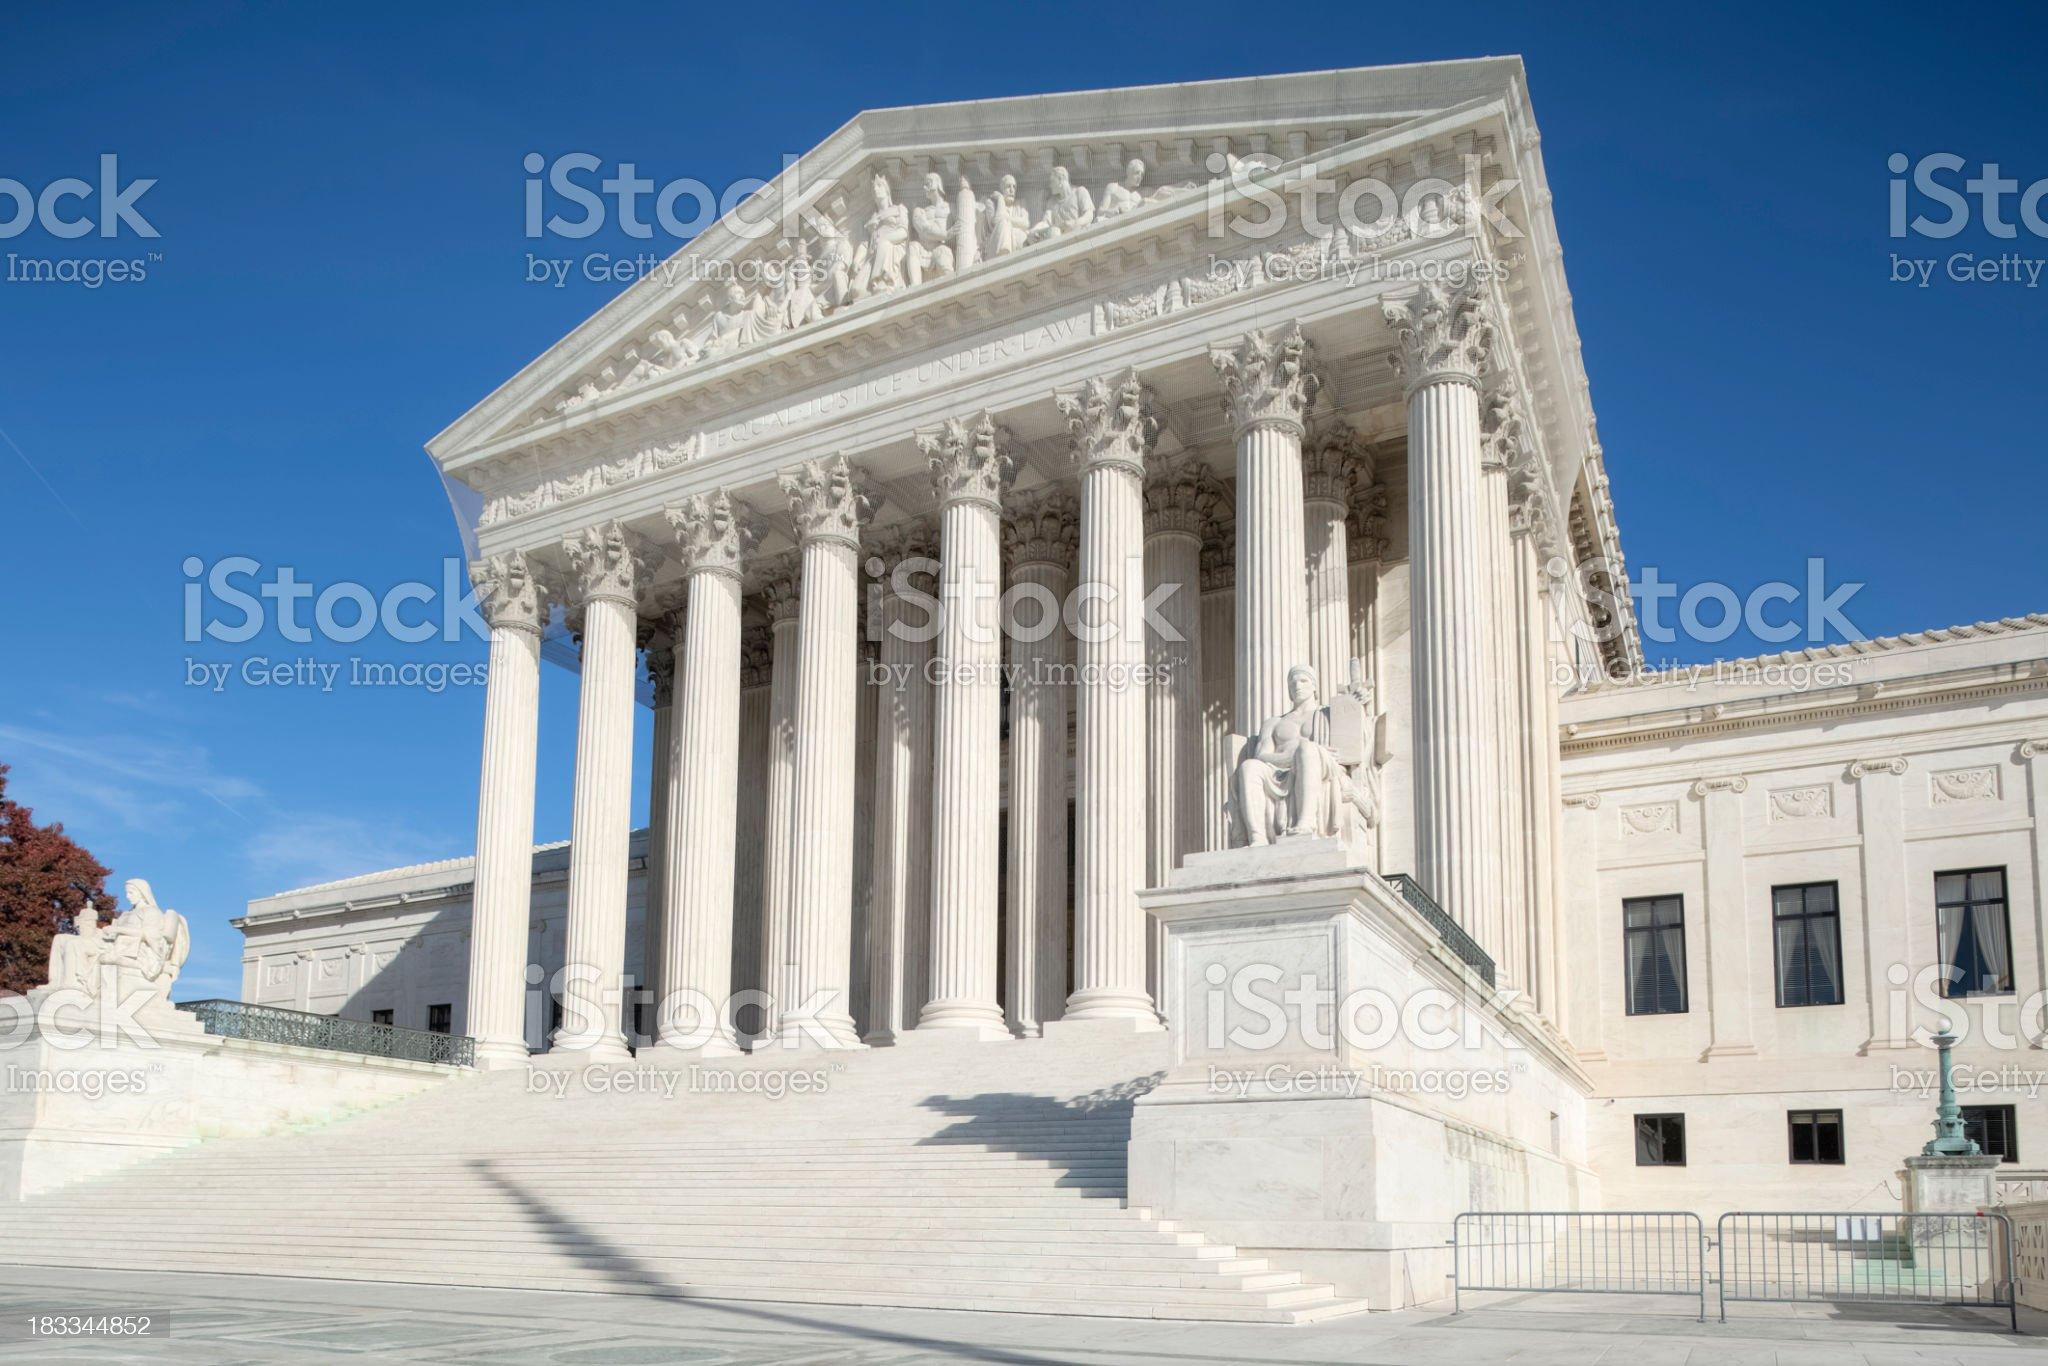 U.S. Supreme Court Catching the Sunshine under Blue Sky royalty-free stock photo